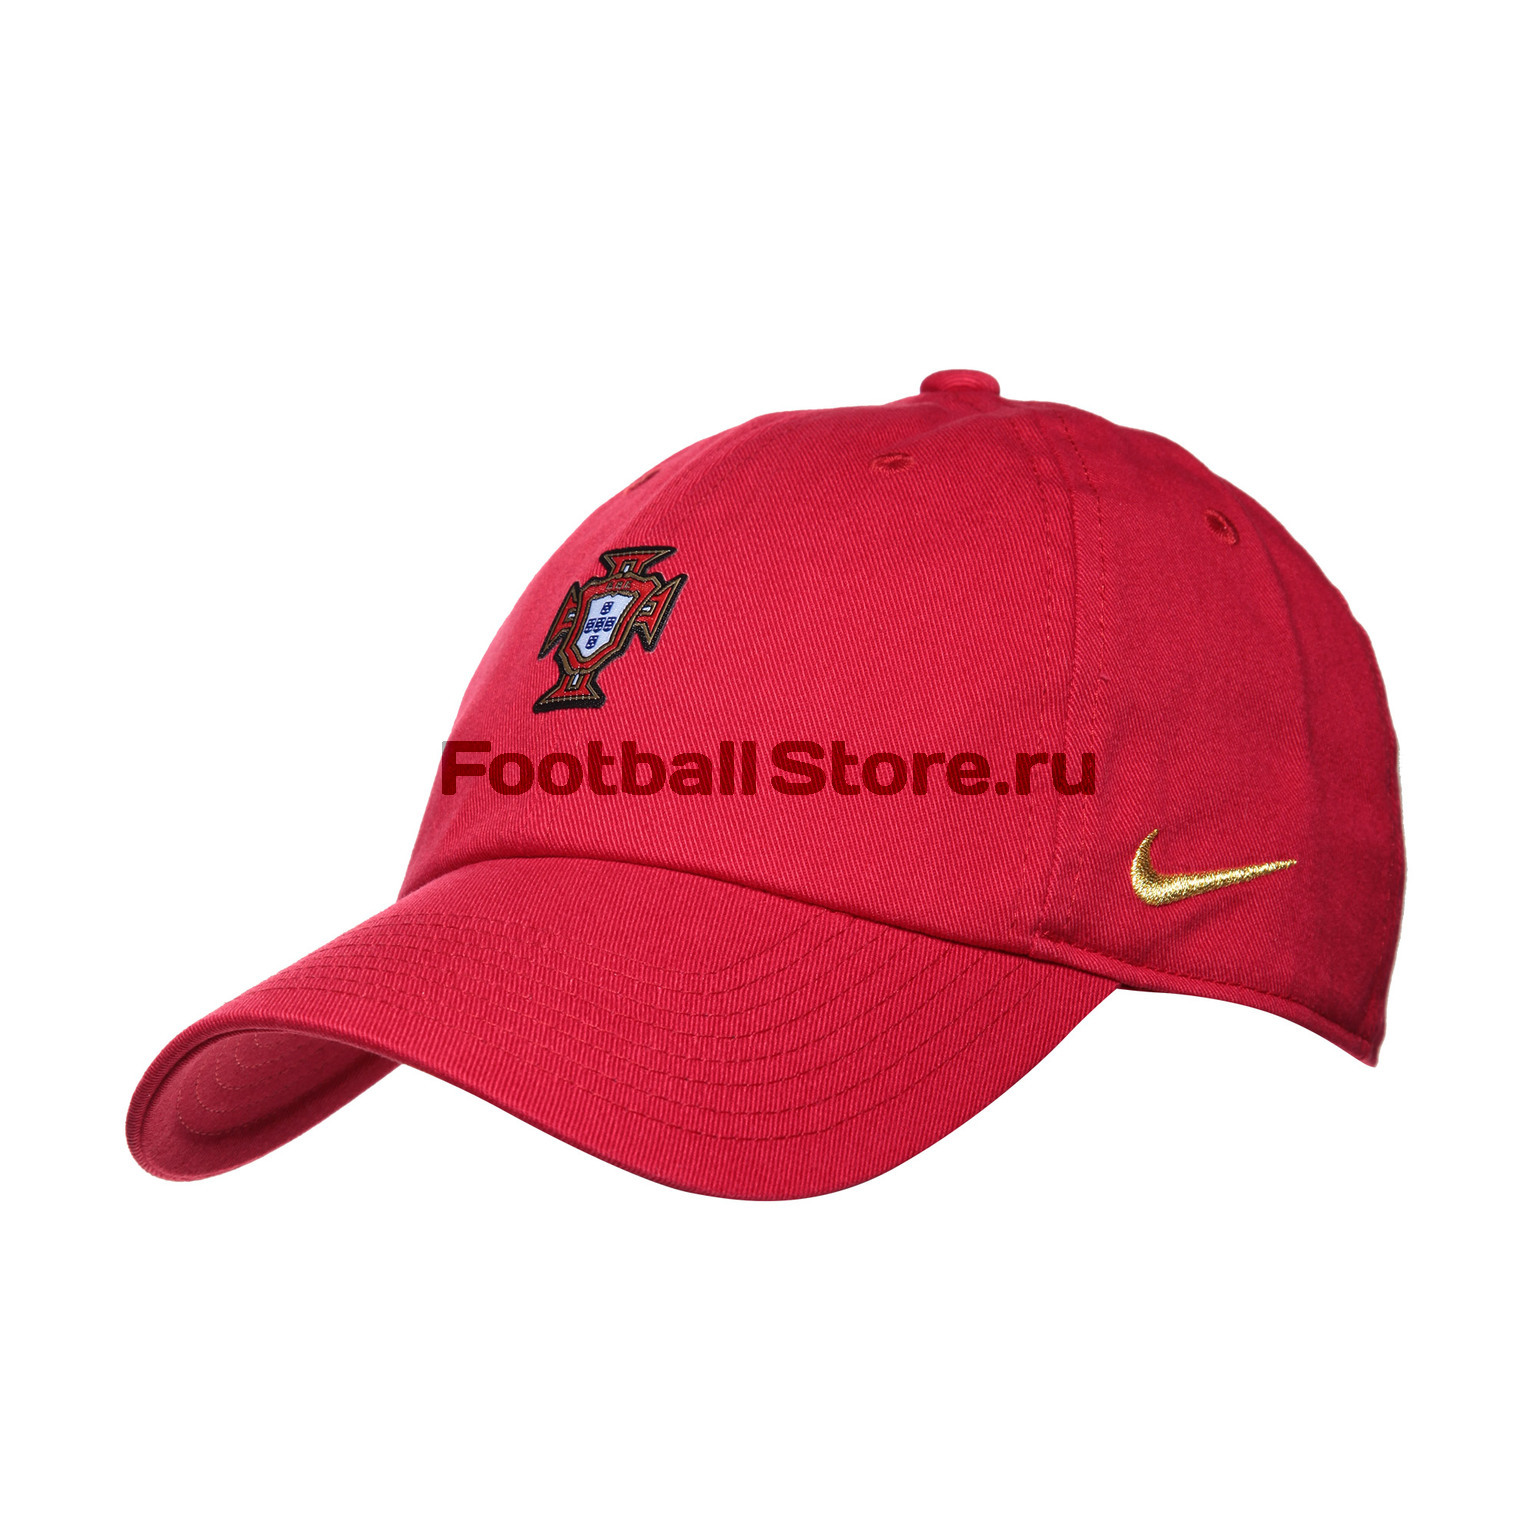 Бейсболка Nike сборной Португалии 898024-677 куртка утепленная nike m nsw synthetic hd jkt 810856 677